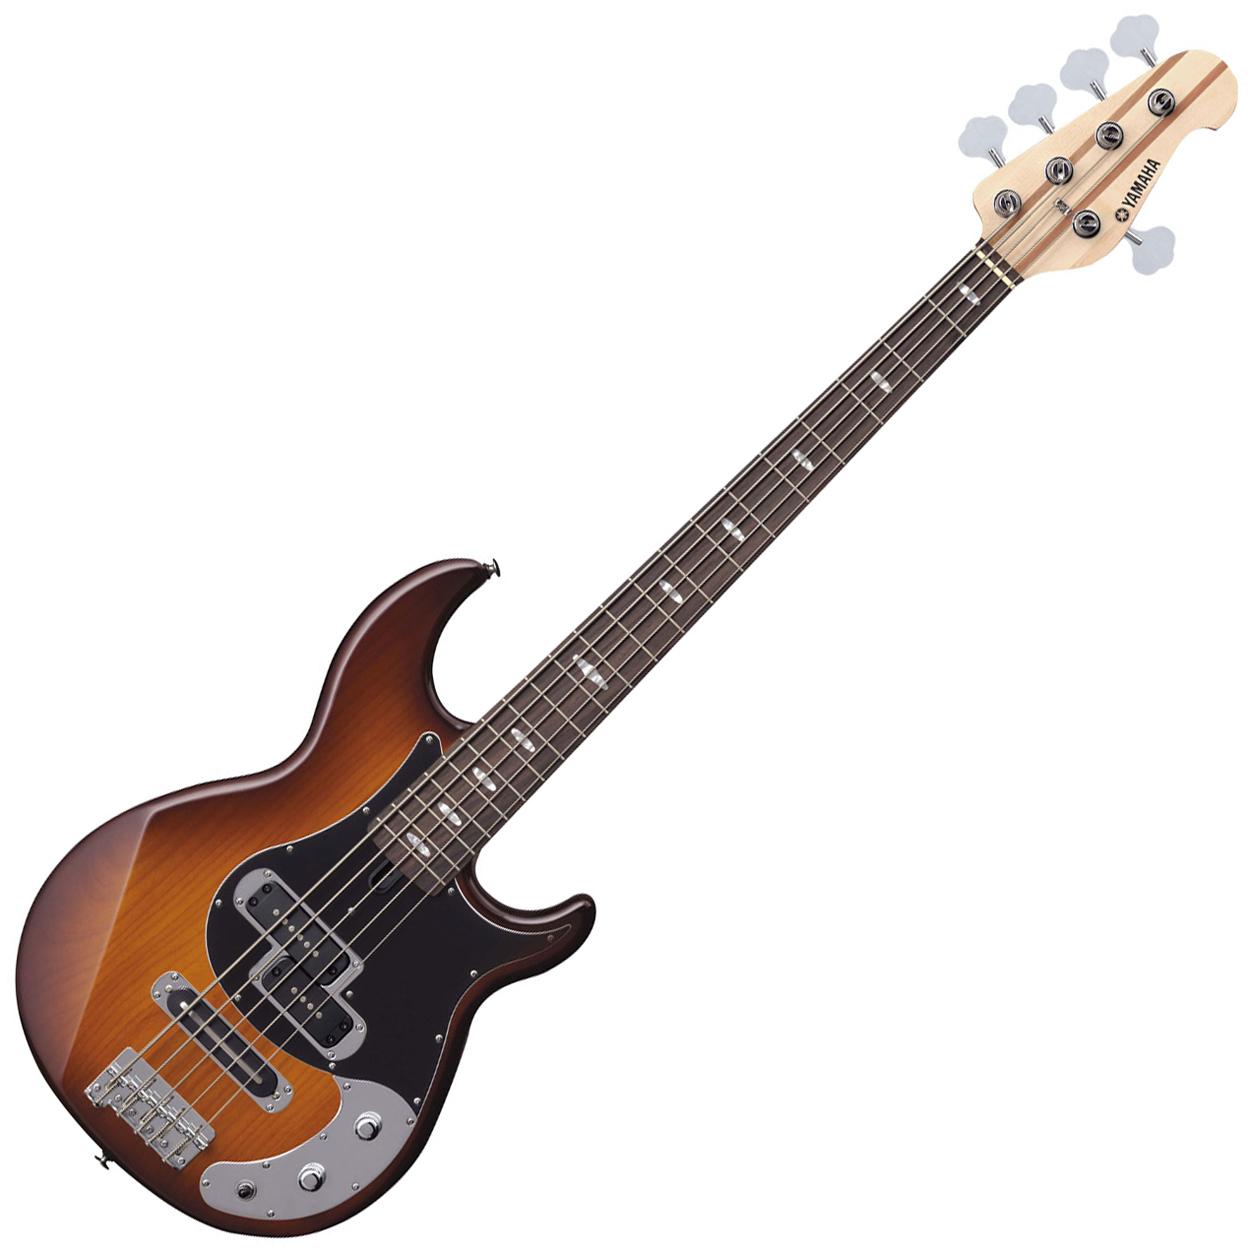 Red Yamaha Bass